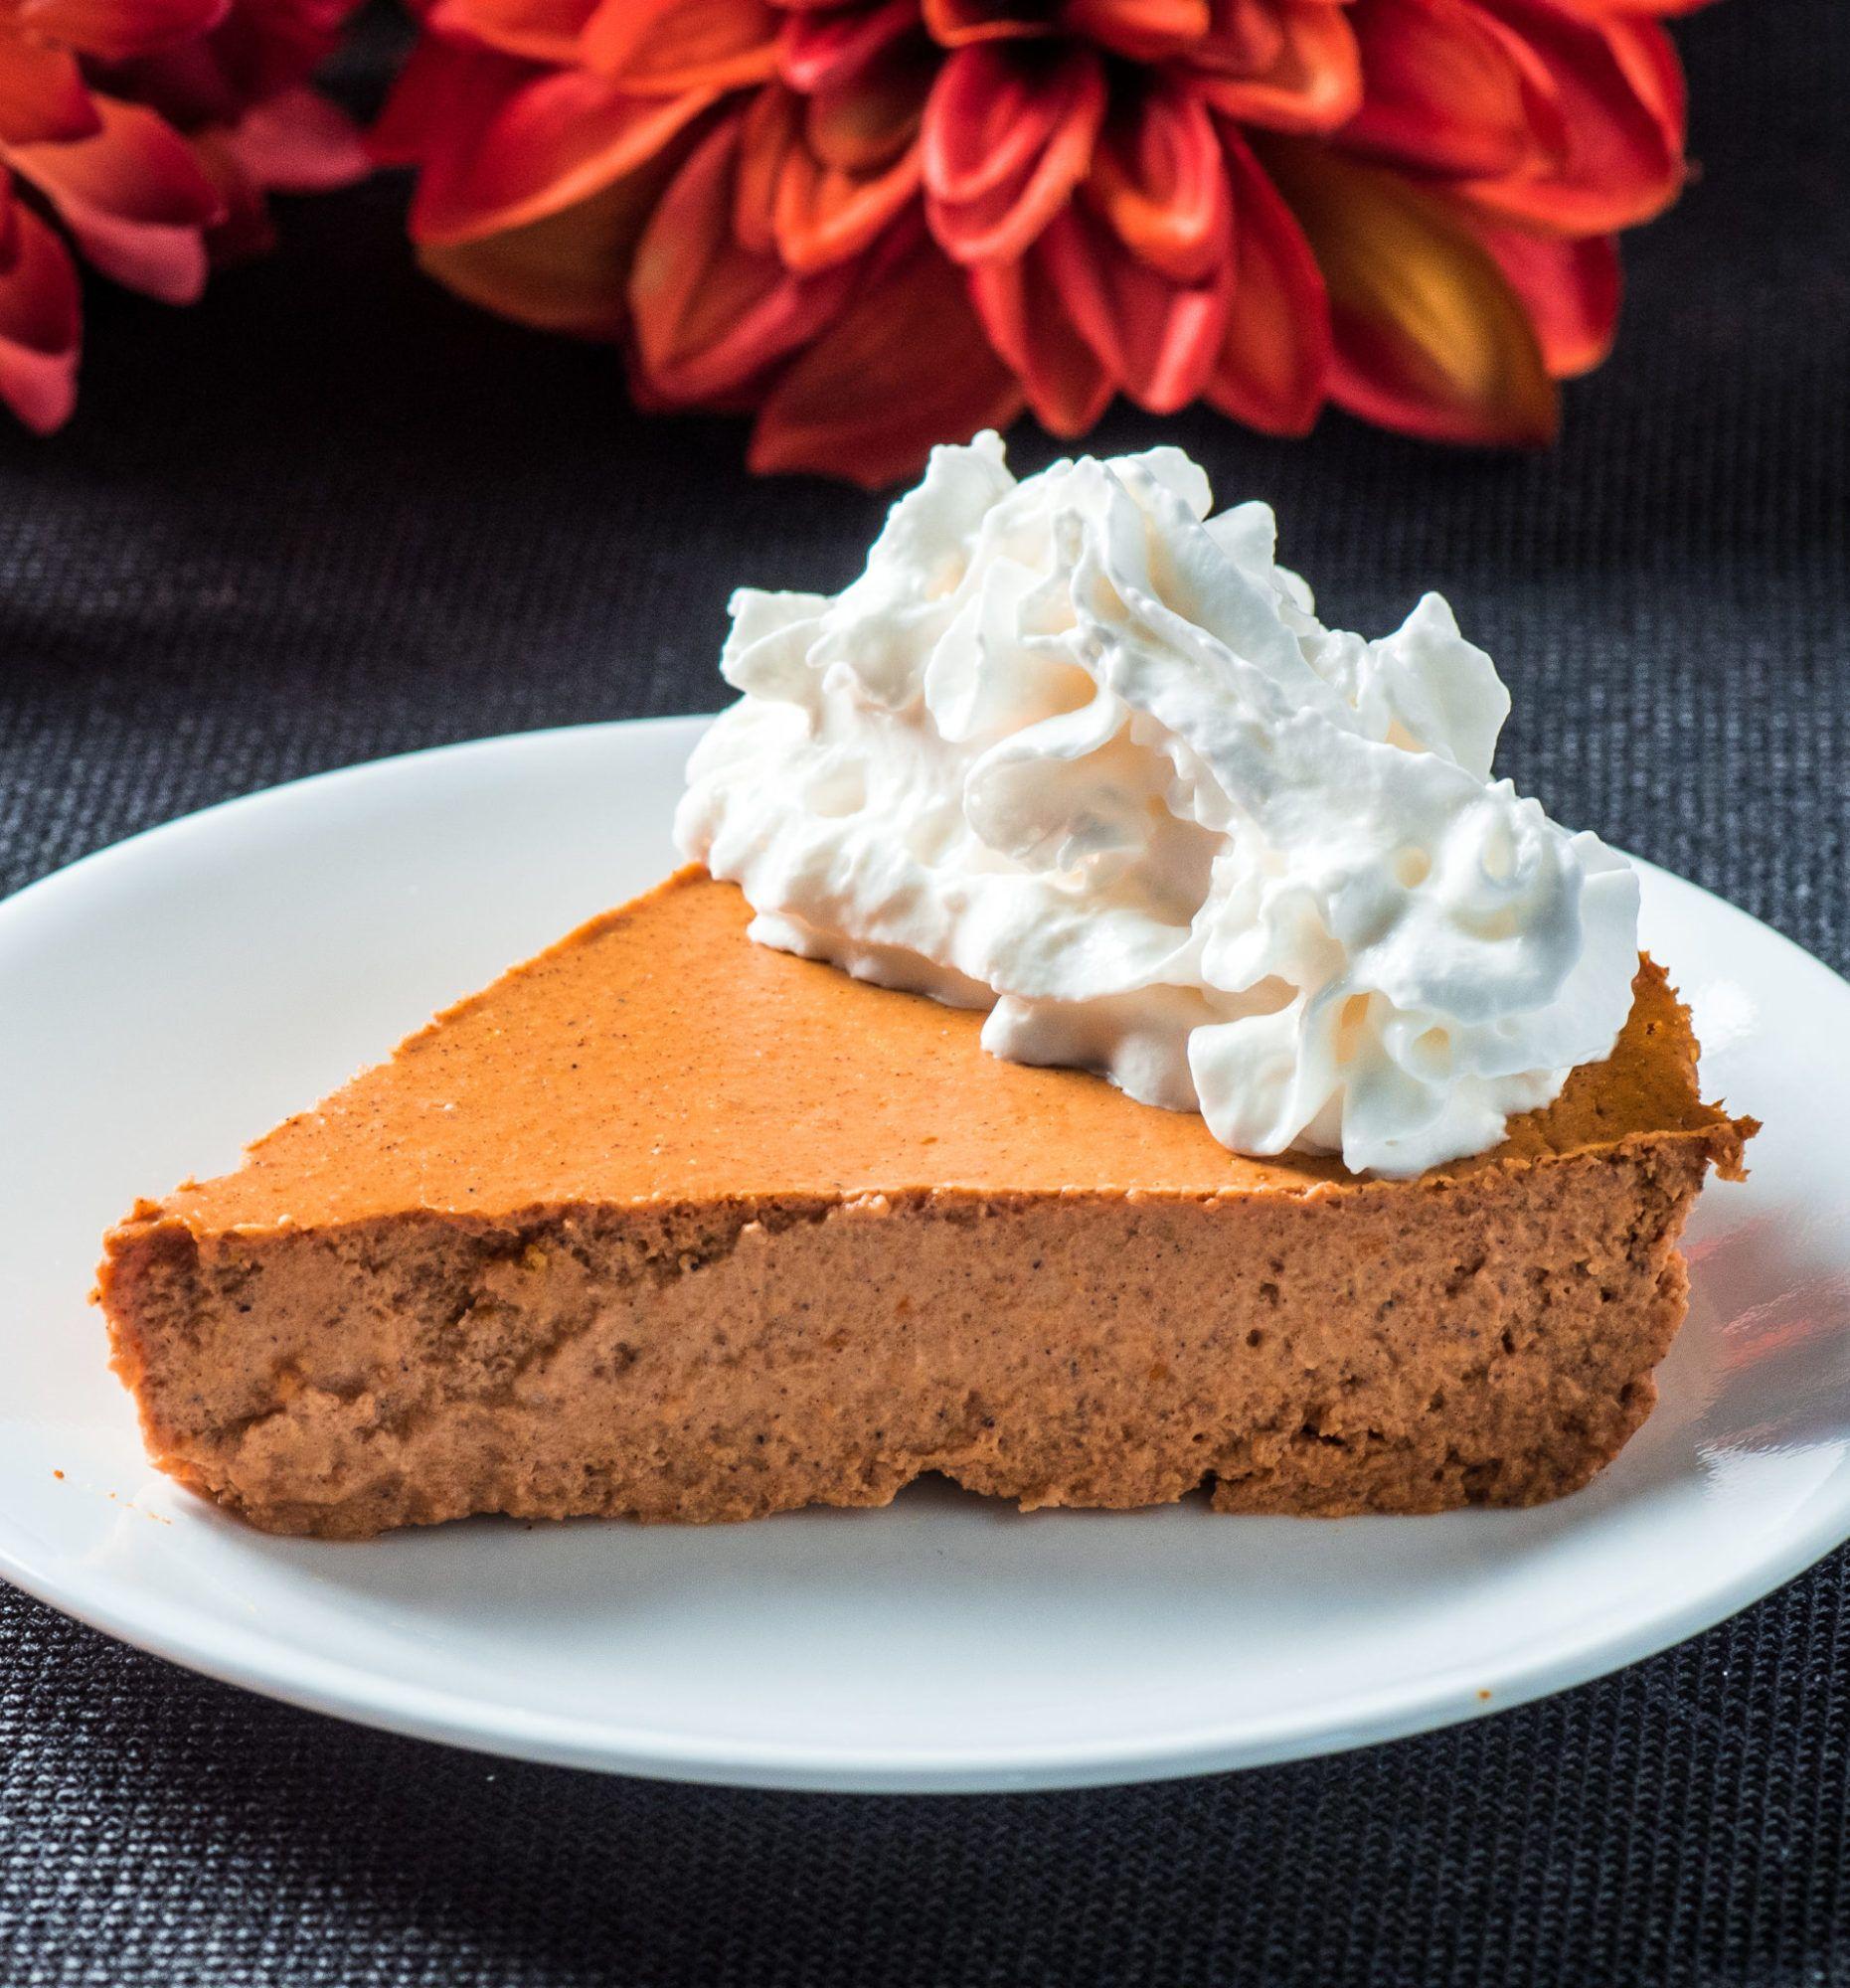 Crustless lowcarb pumpkin pie recipe low carb pumpkin